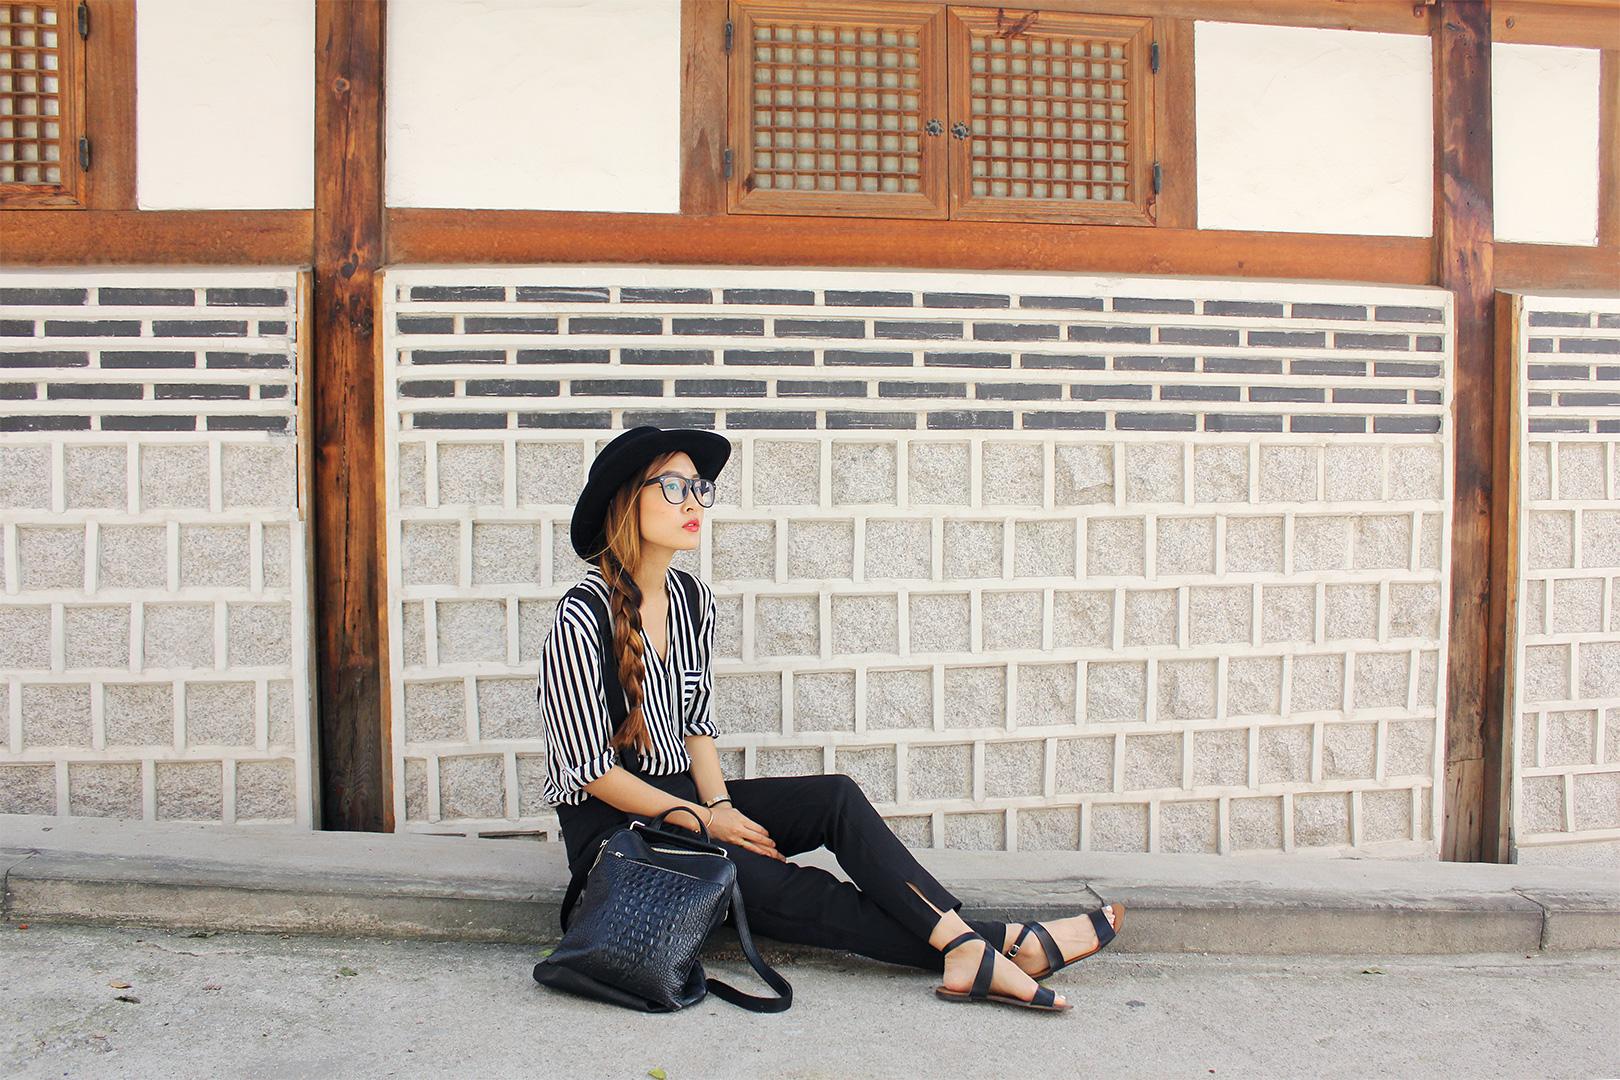 Monochrome overalls and beautiful hanji windows.